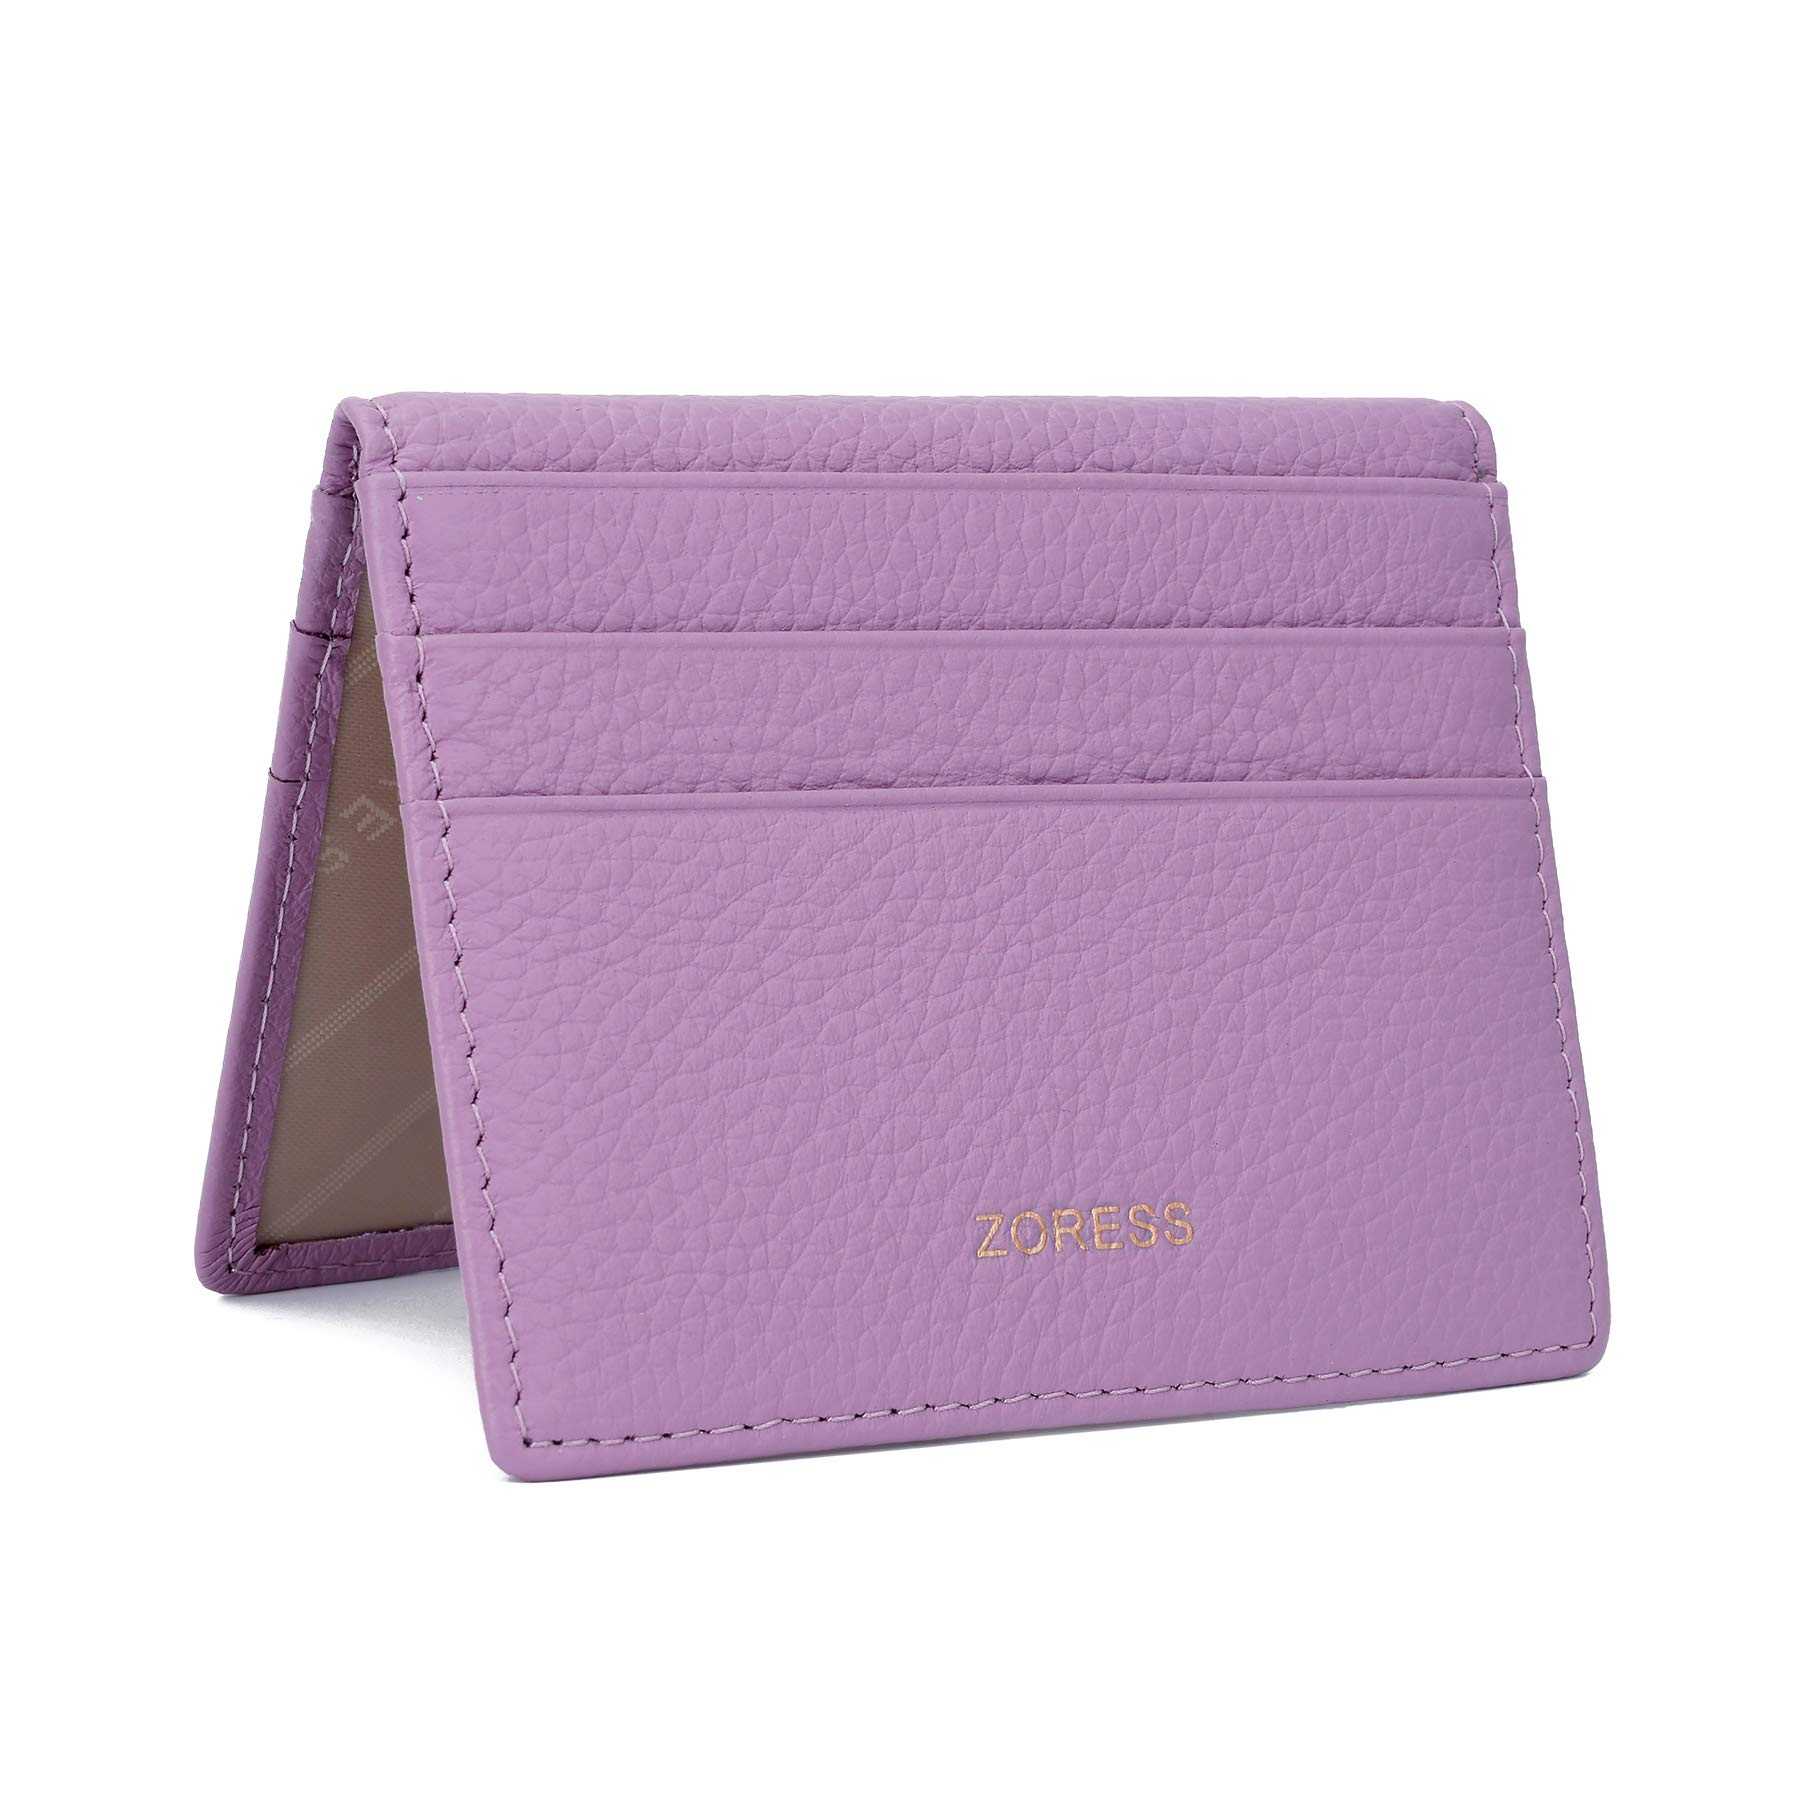 ZORESS Womens Leather RFID Blocking Slim Credit Card Case Holder Travel Front Pocket Wallet (Purple)